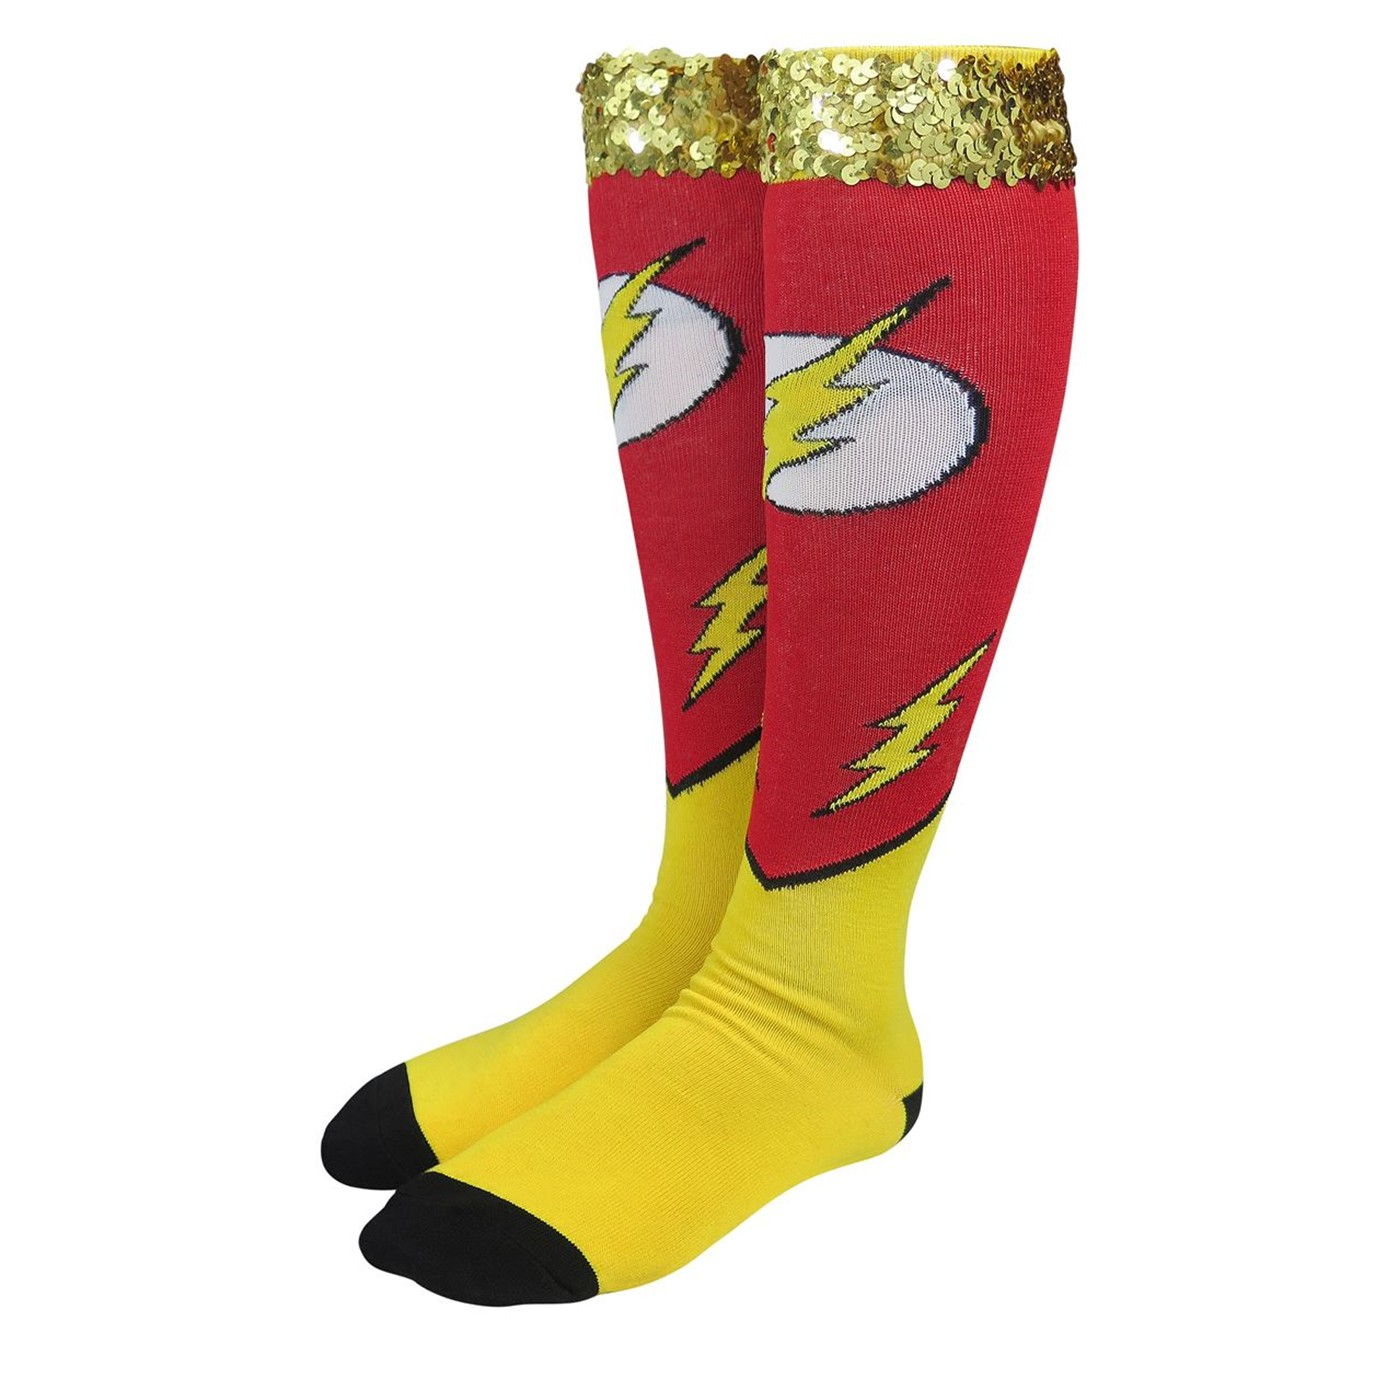 Flash Costume Women's Knee High Socks